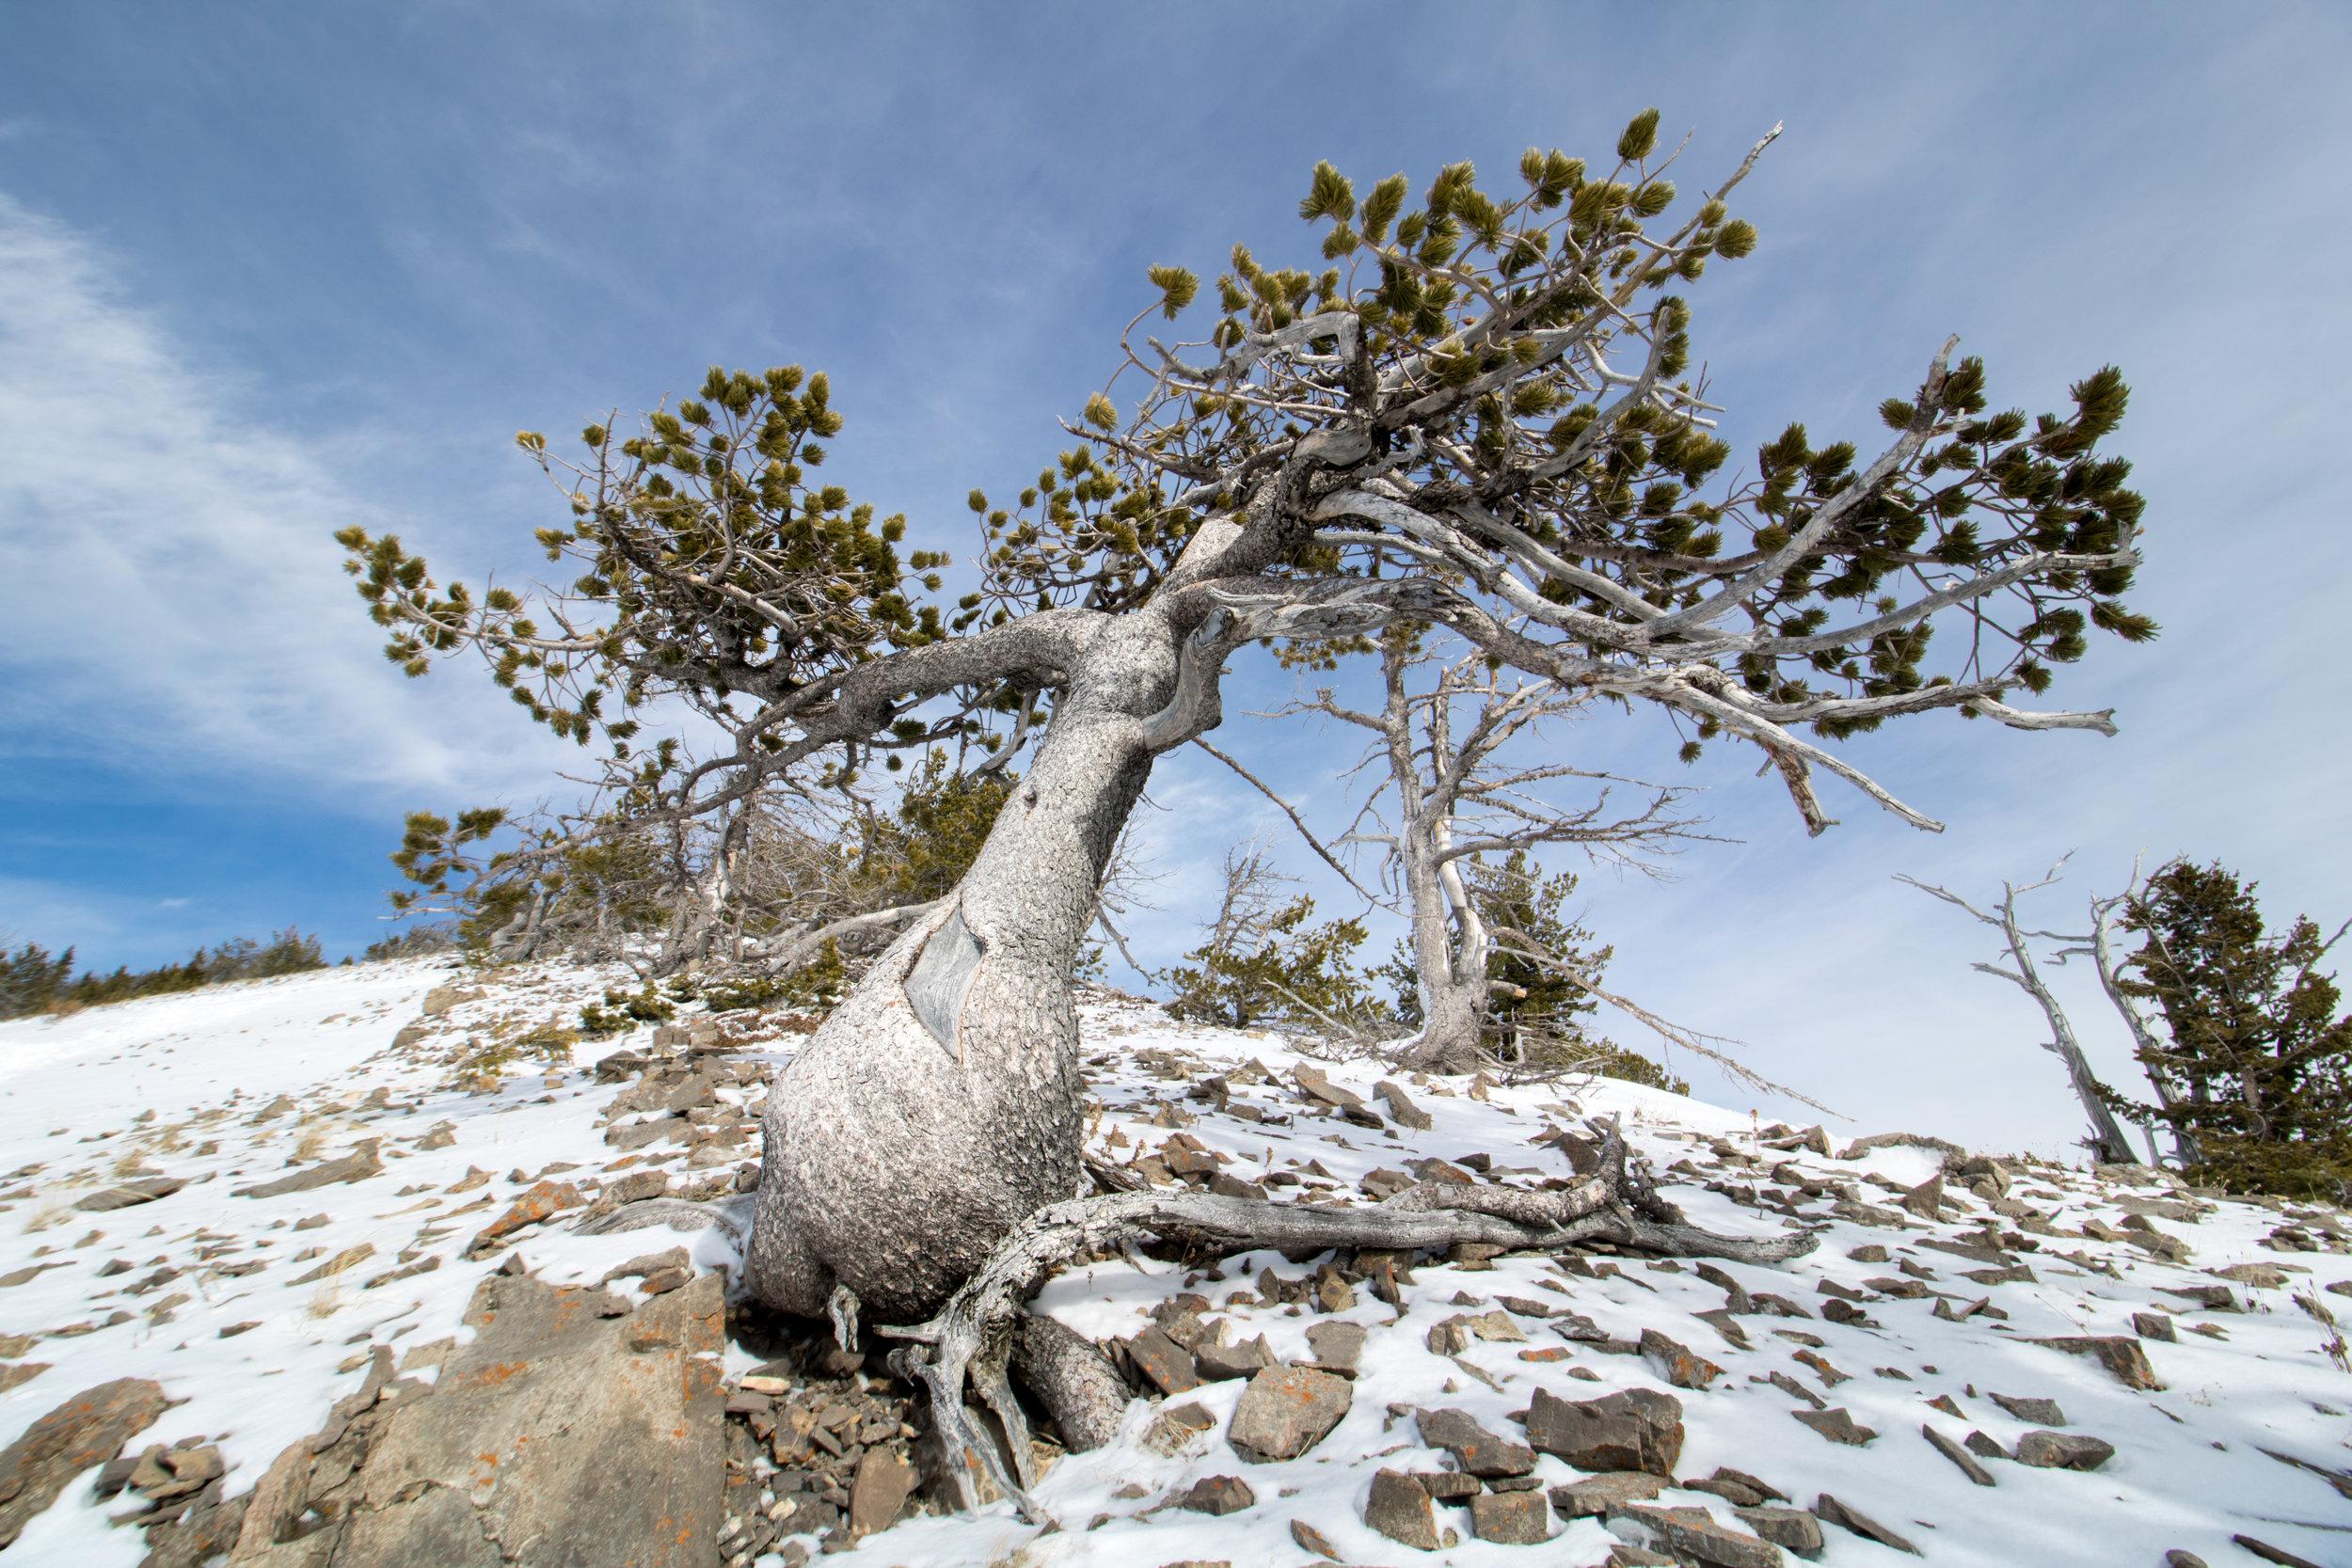 Winter Tree. Gallatin N.F., Mont. (Nov. 2016)